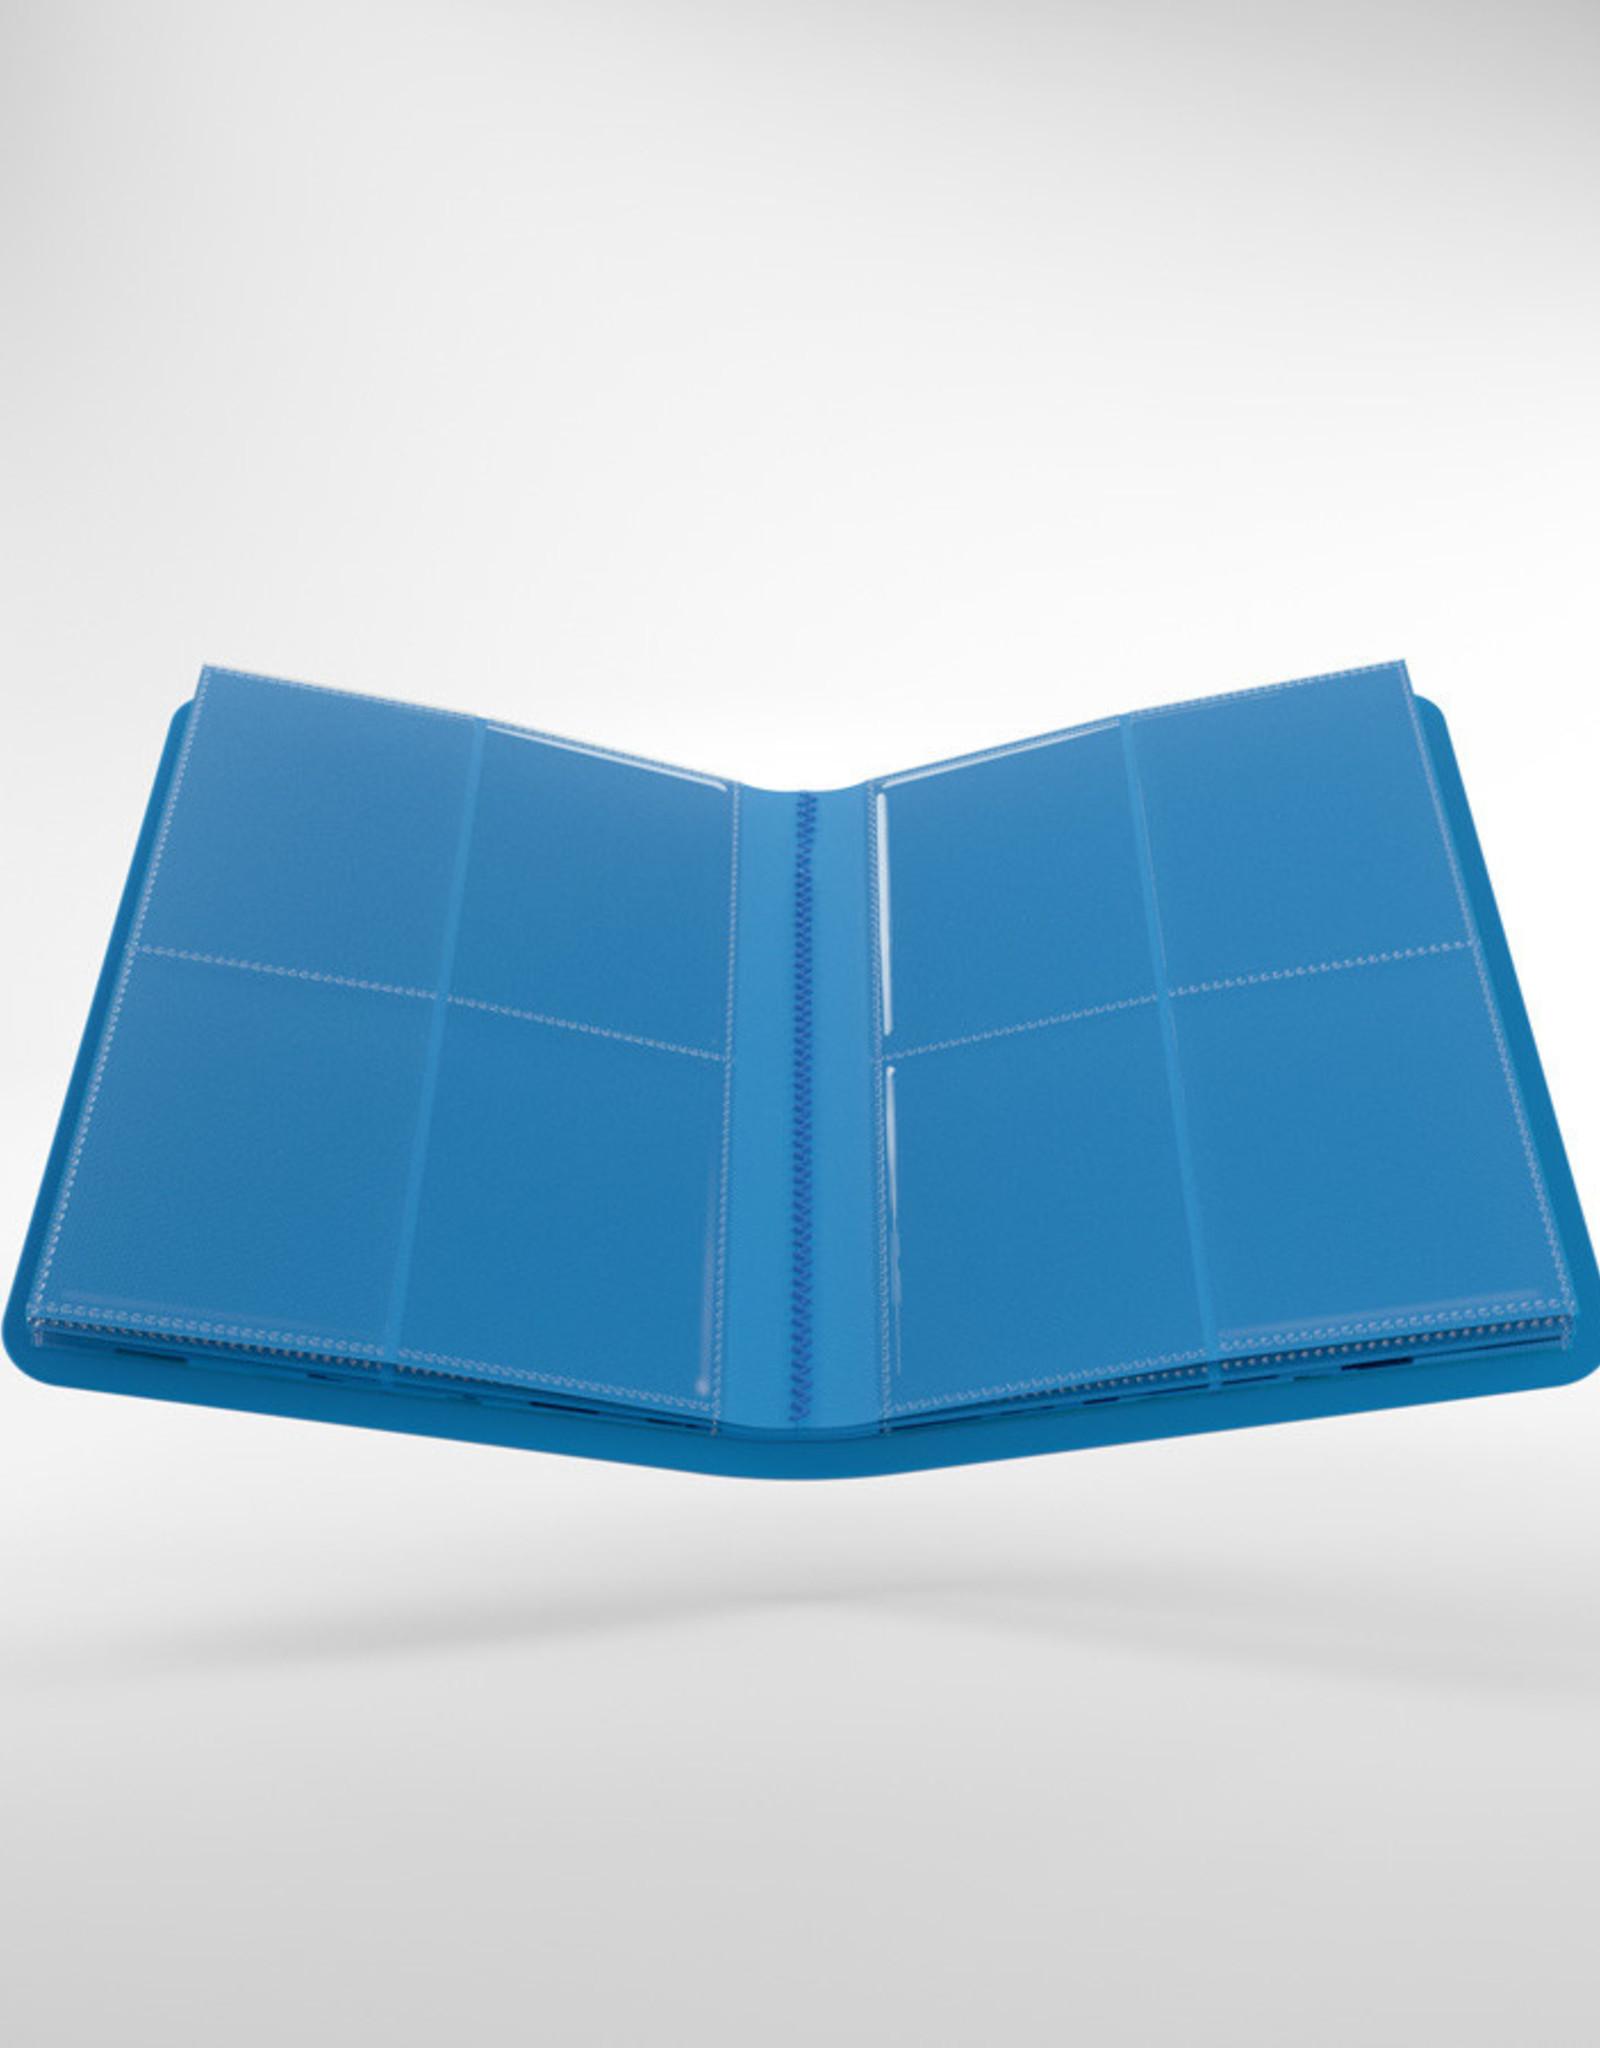 Casual Album: 8-Pocket Side-Loading Blue